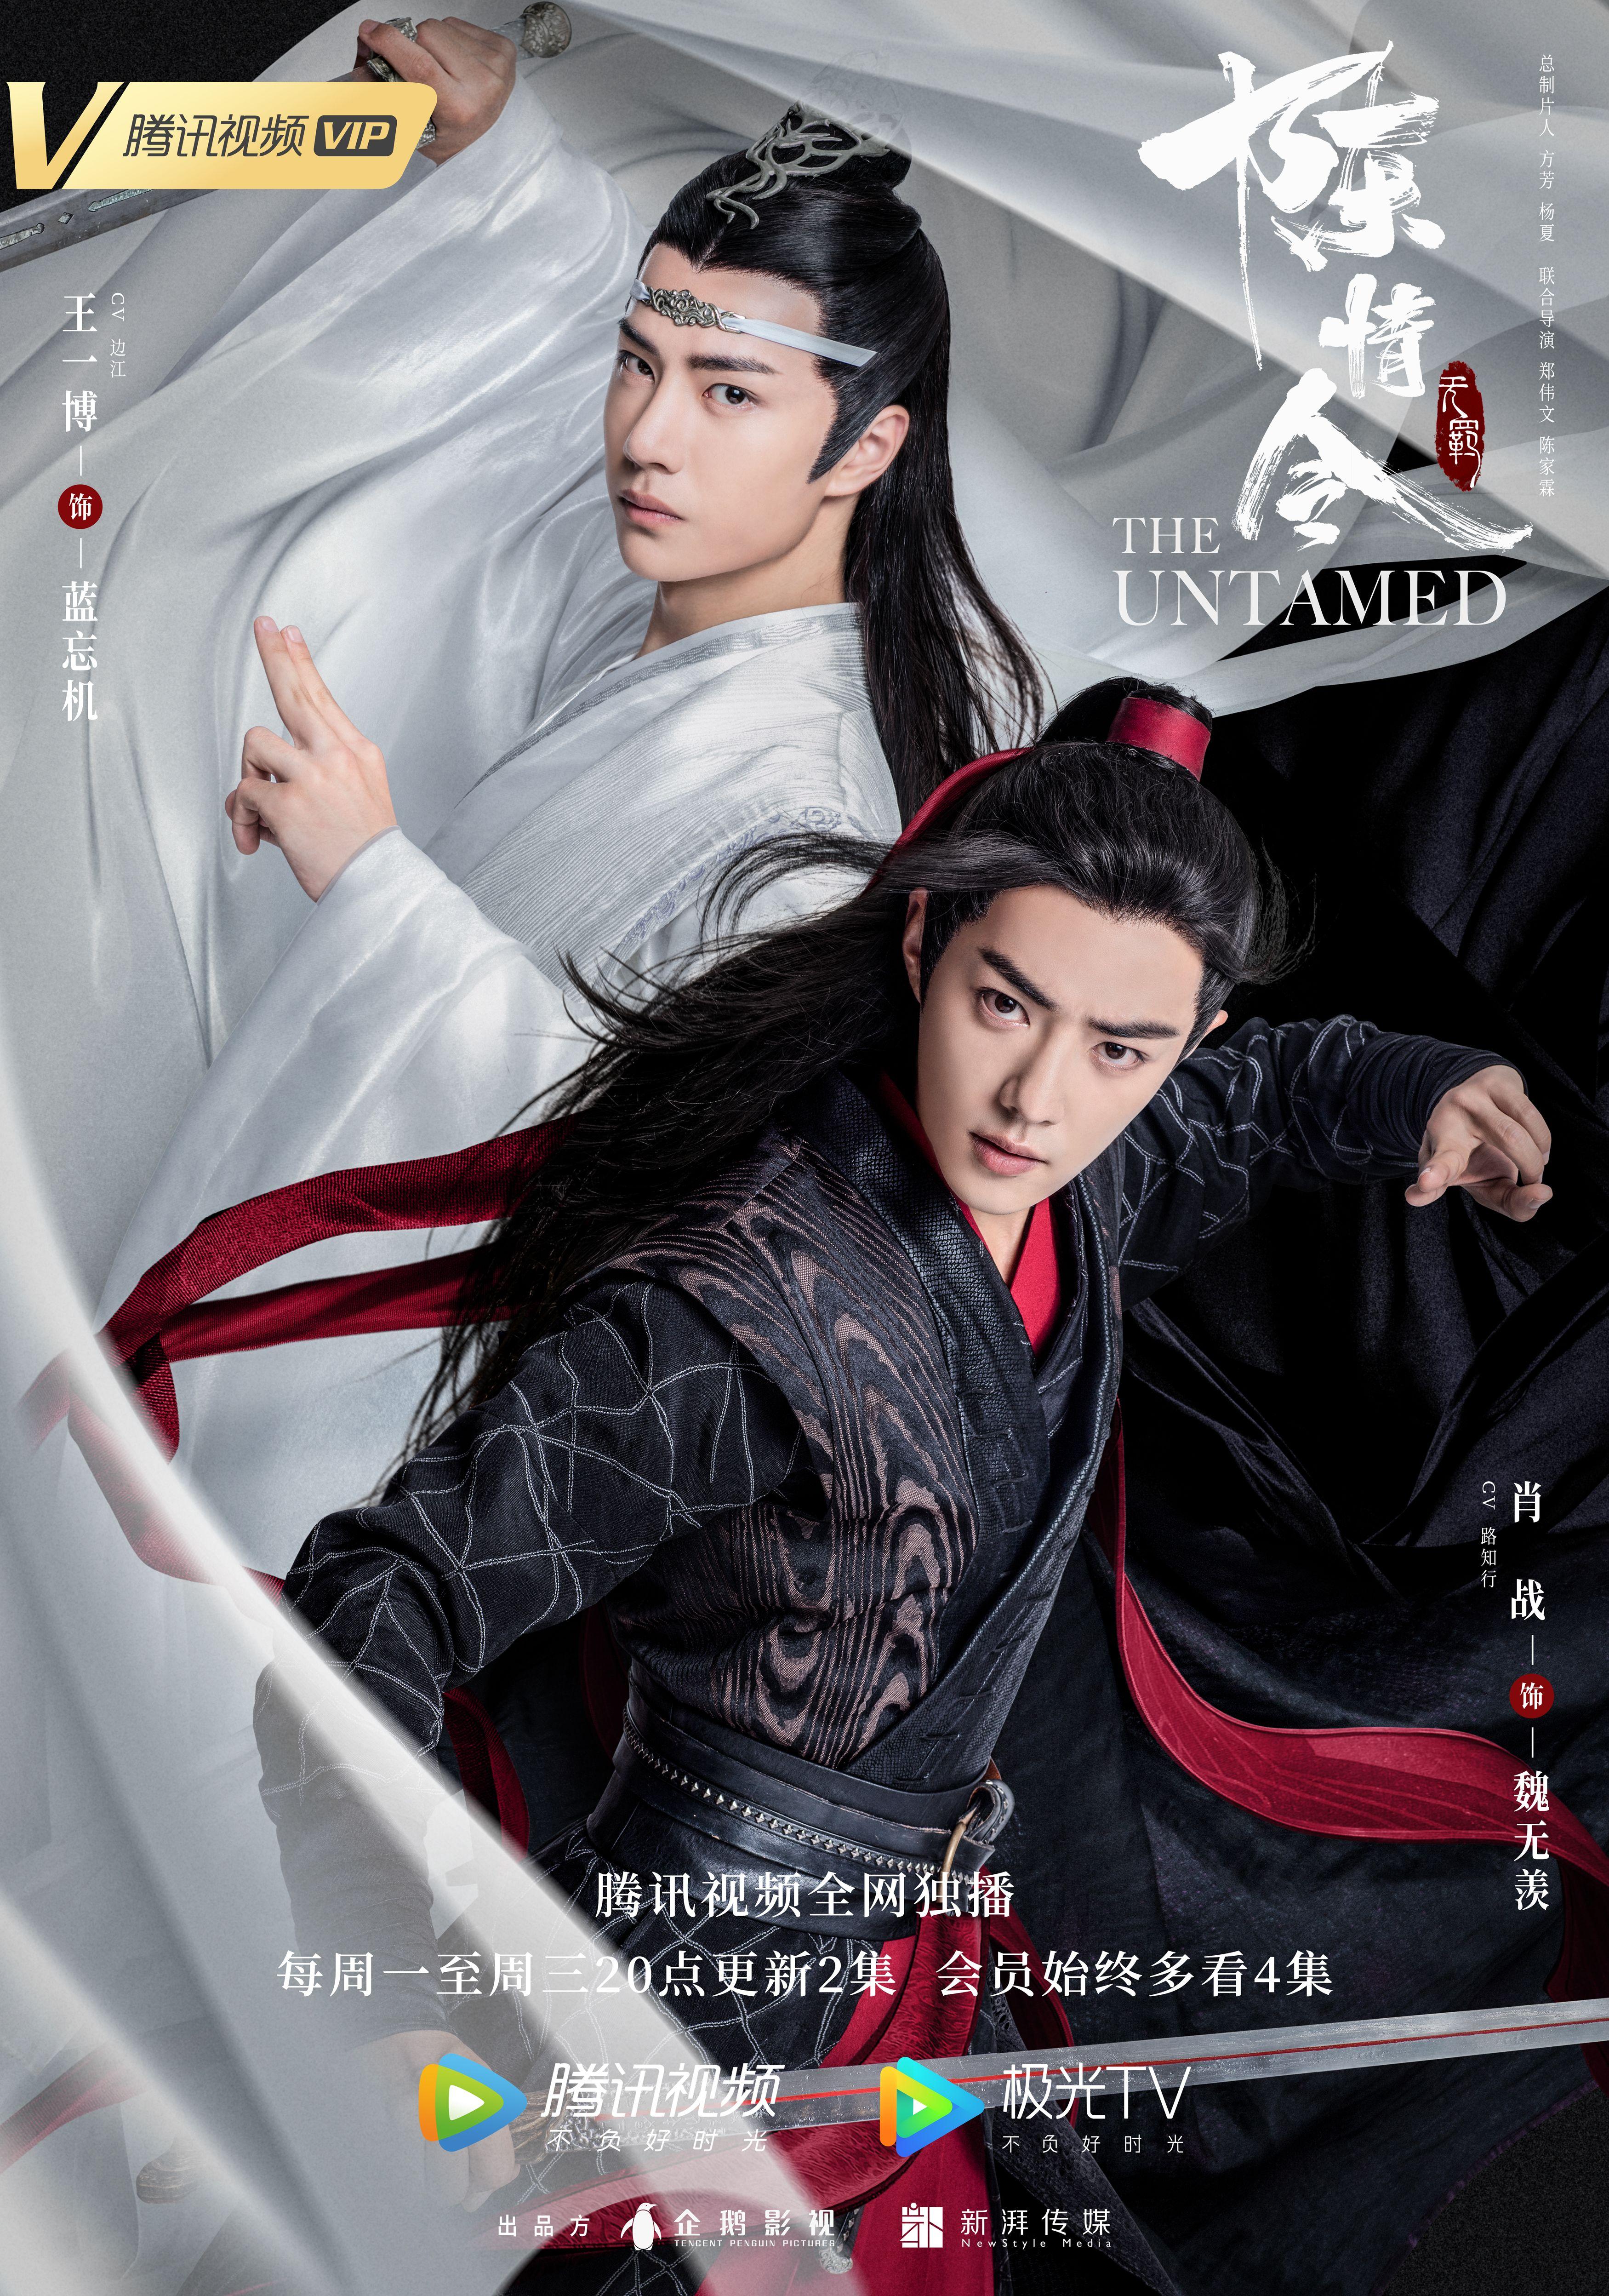 Xiao Zhan Wallpapers Wallpaper Cave in 2020 Drama